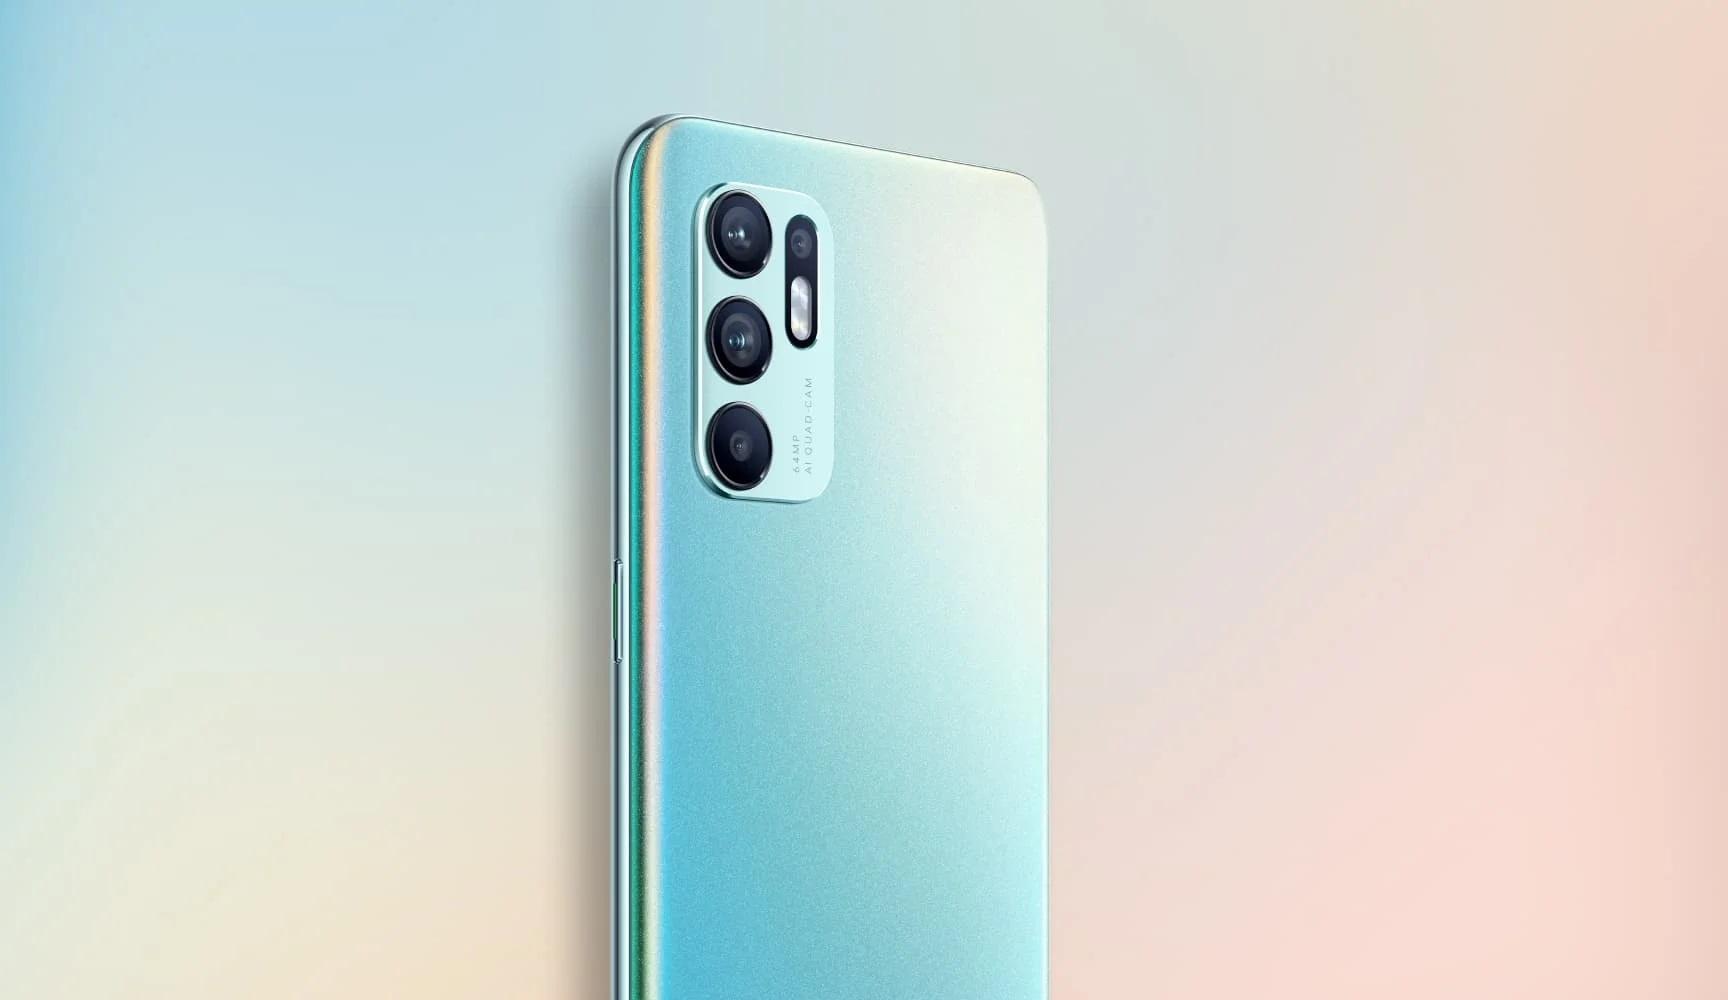 smartfon Oppo Reno 6 4G smartphone